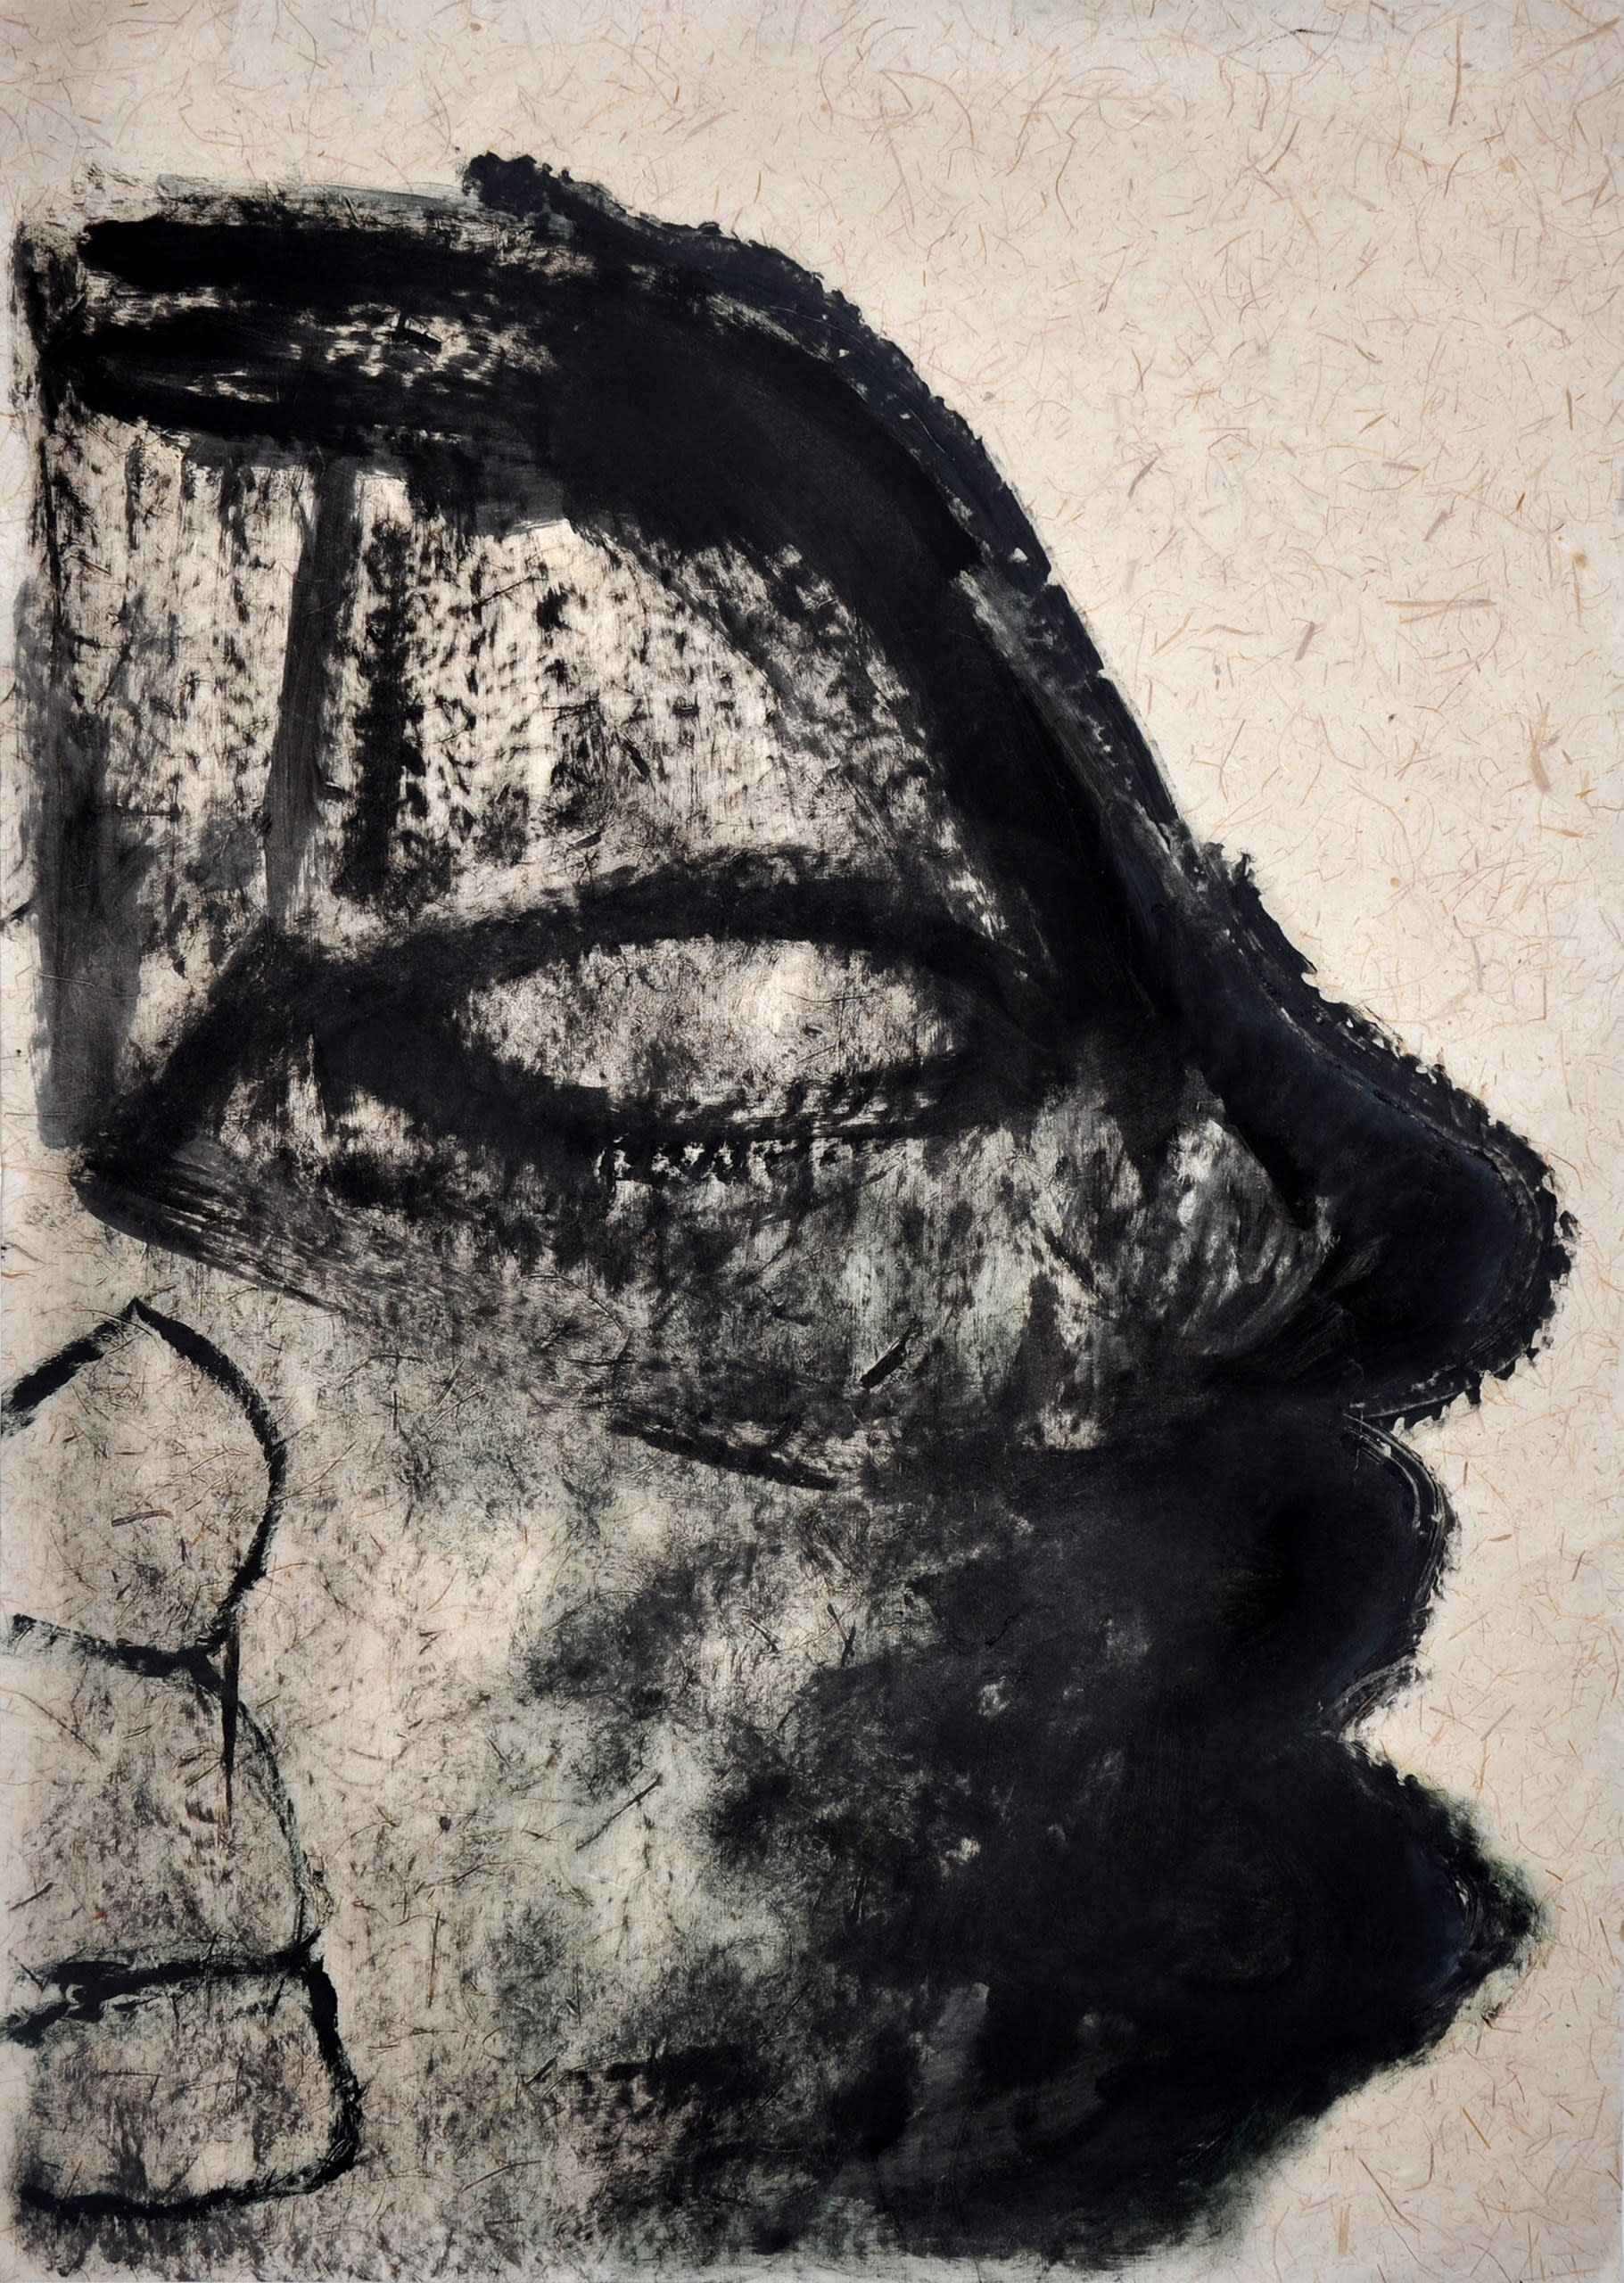 Untitled self portrait 6 2020